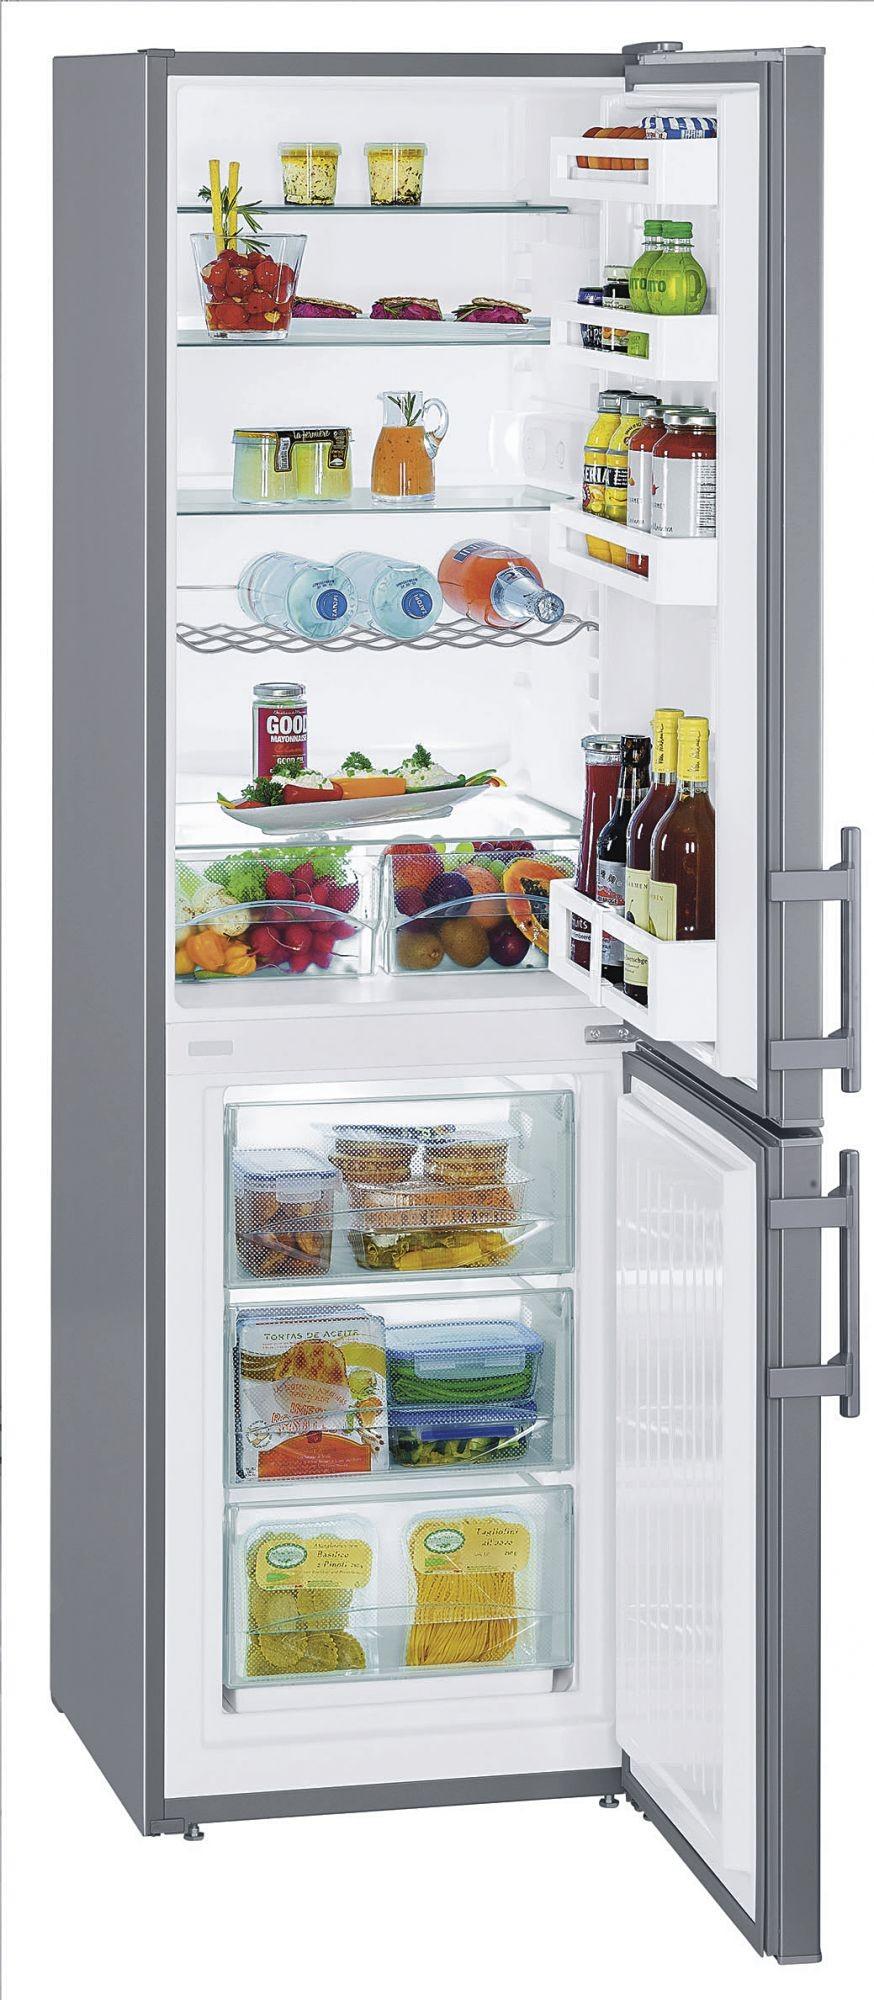 teamsix cuef 3311 20 edelstahl liebherr fachhandel combinati frigo congelatore. Black Bedroom Furniture Sets. Home Design Ideas